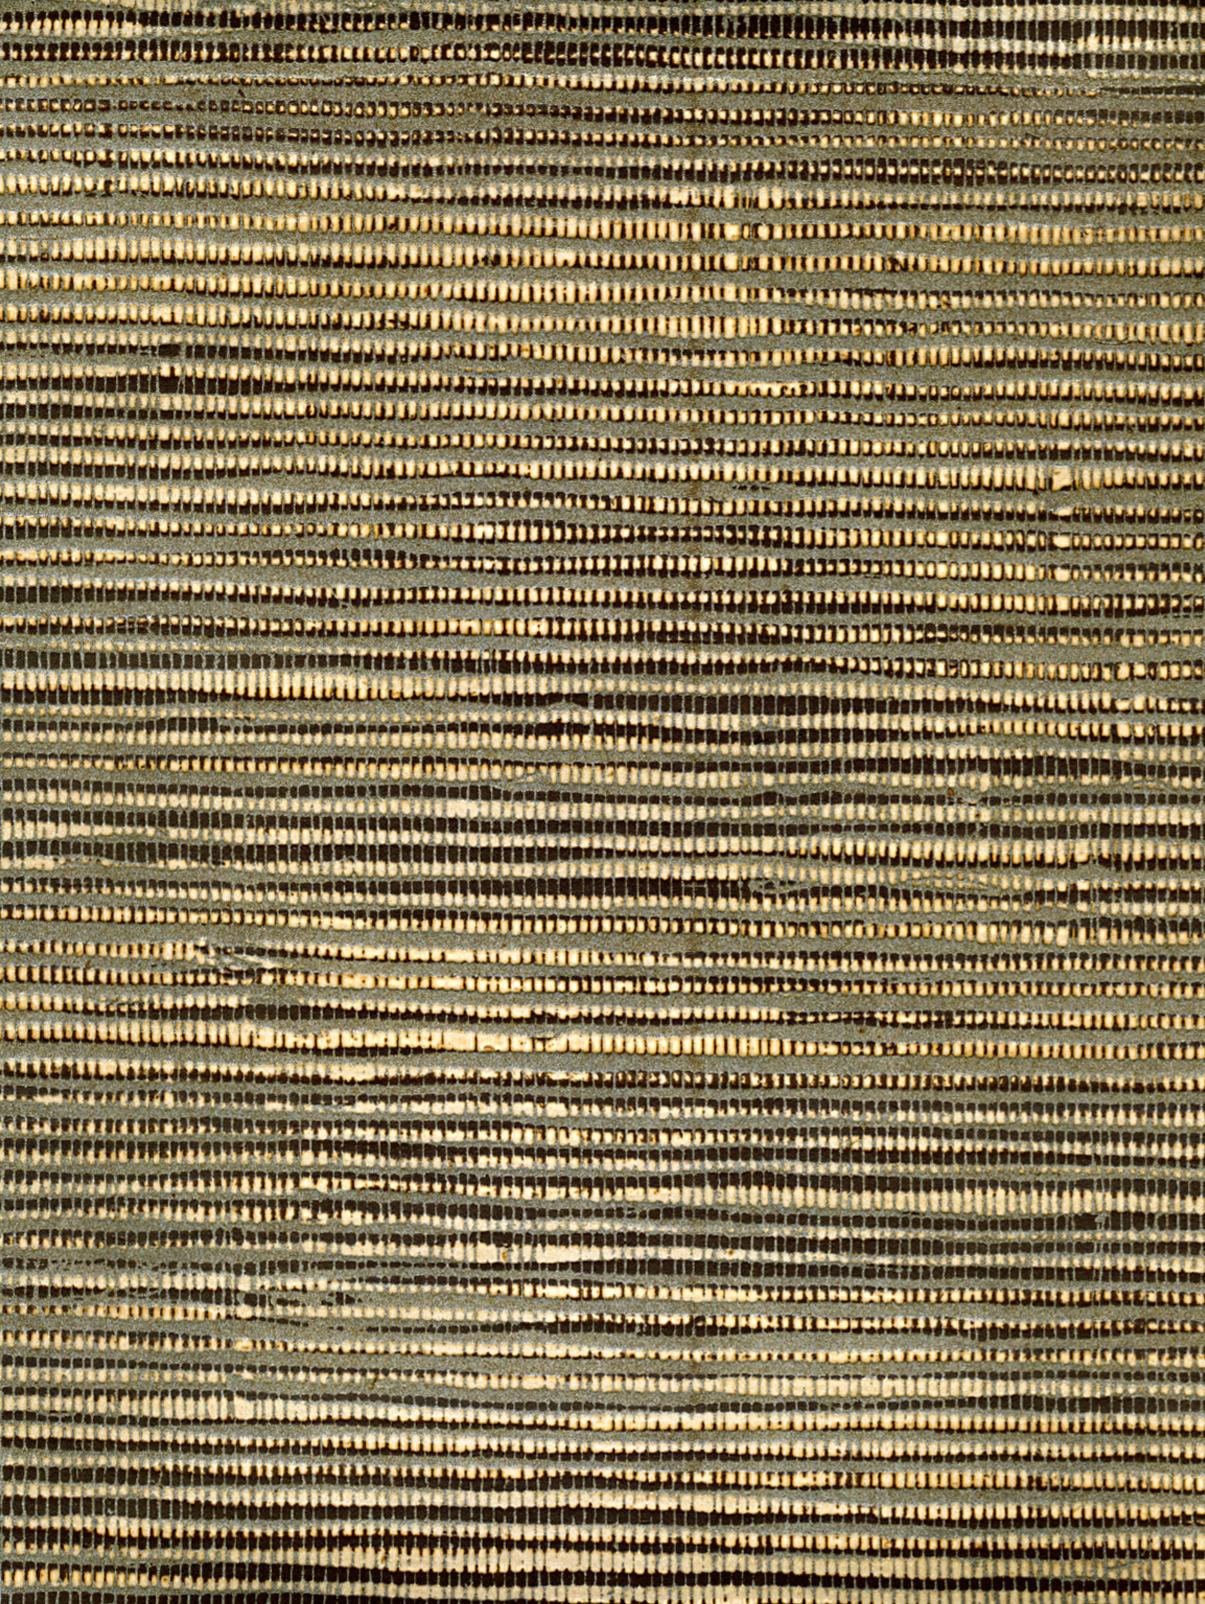 luxury-grasscloth-rc-8952.jpg